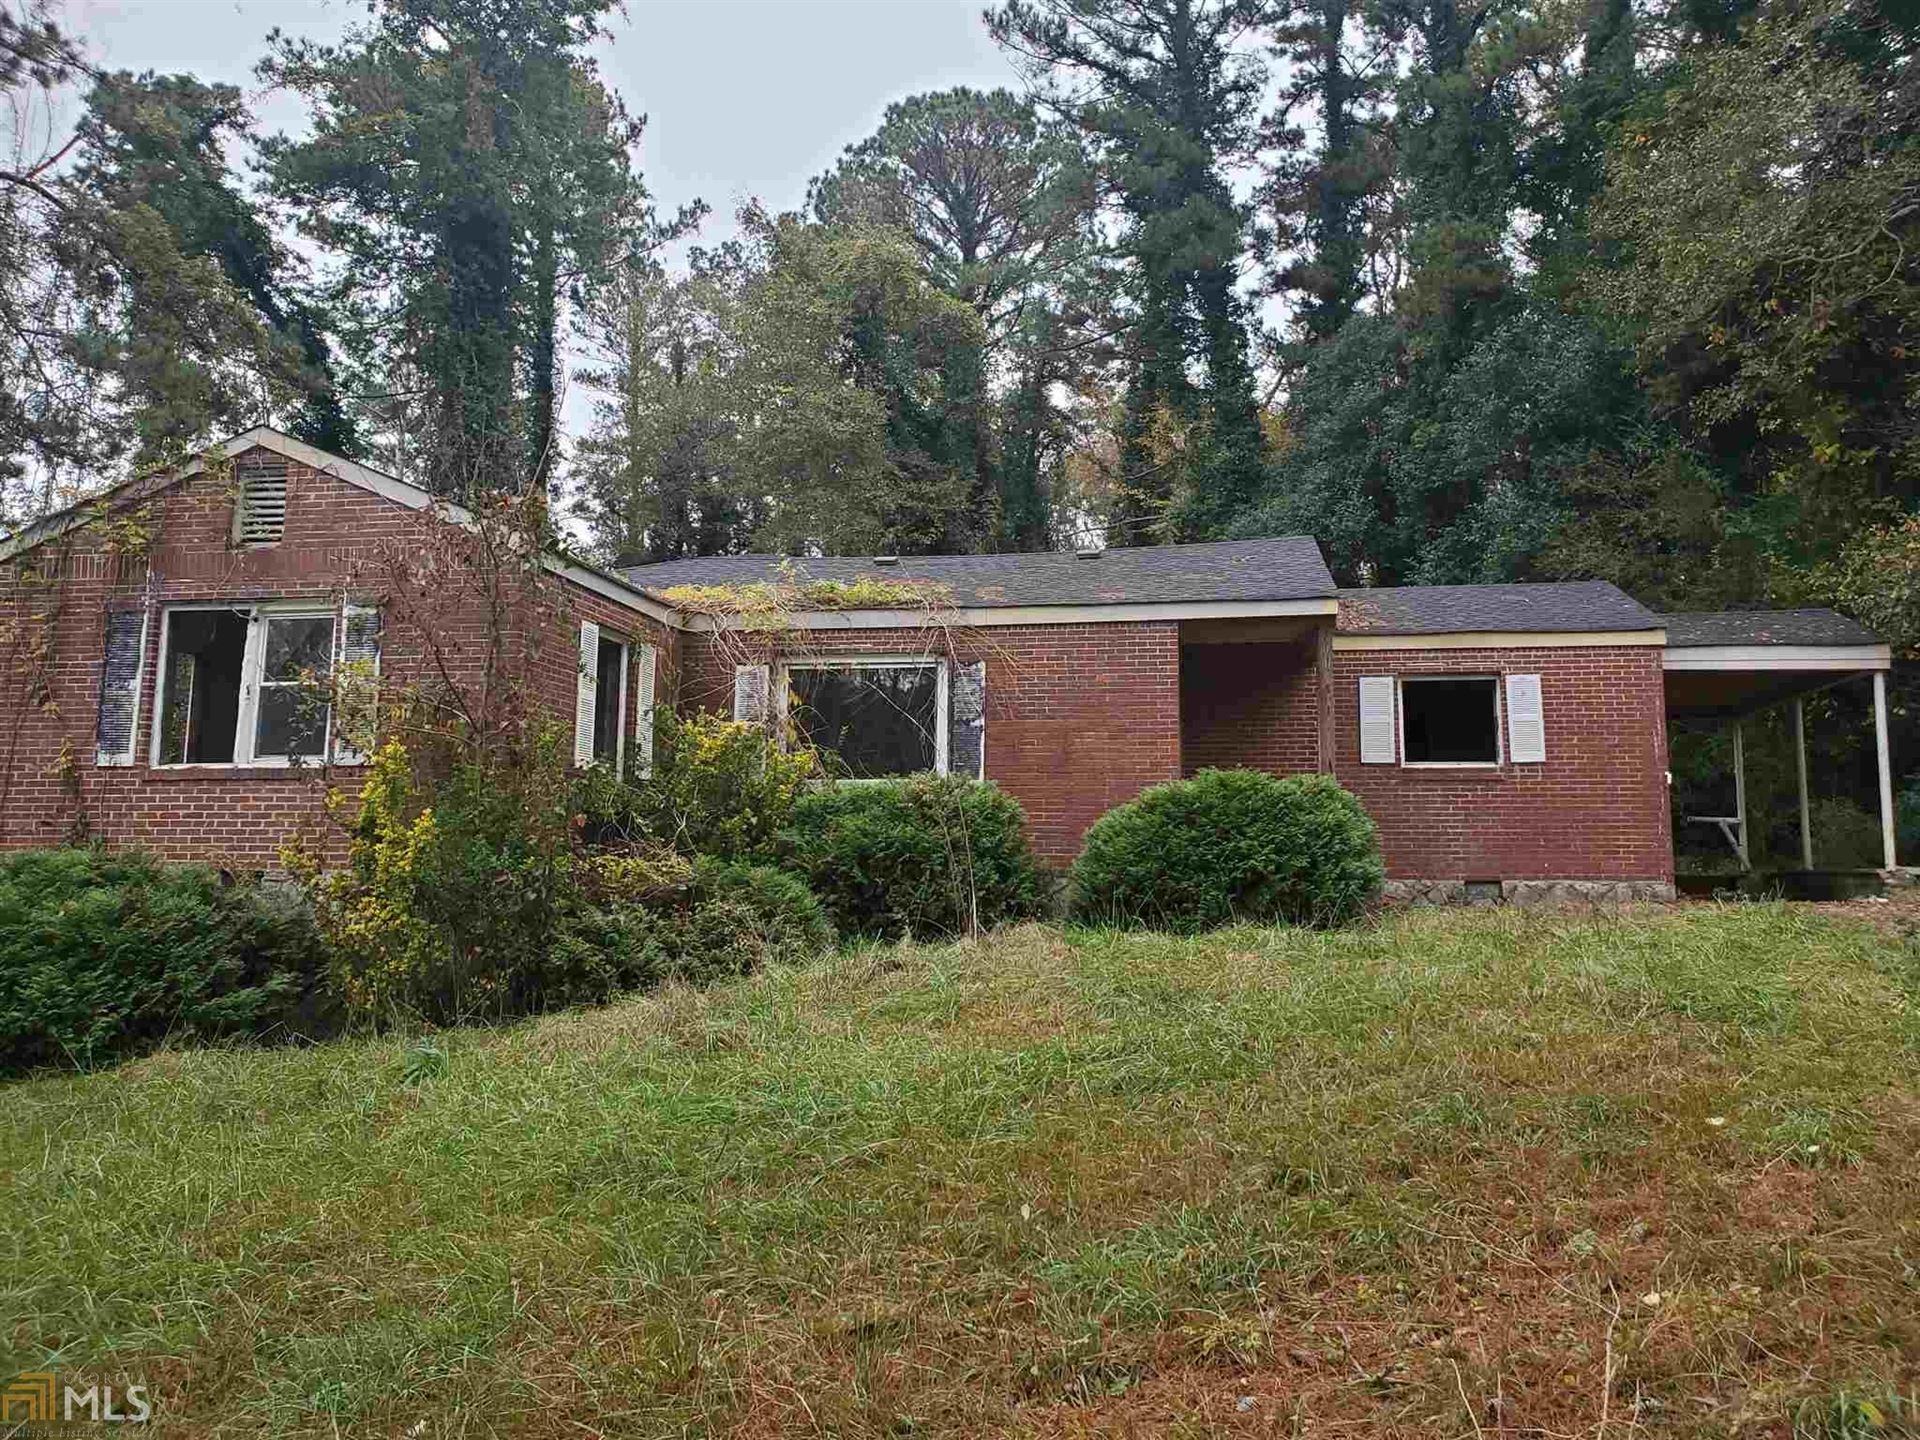 6654 Old Covington Rd, Lithonia, GA 30058 - MLS#: 8898131